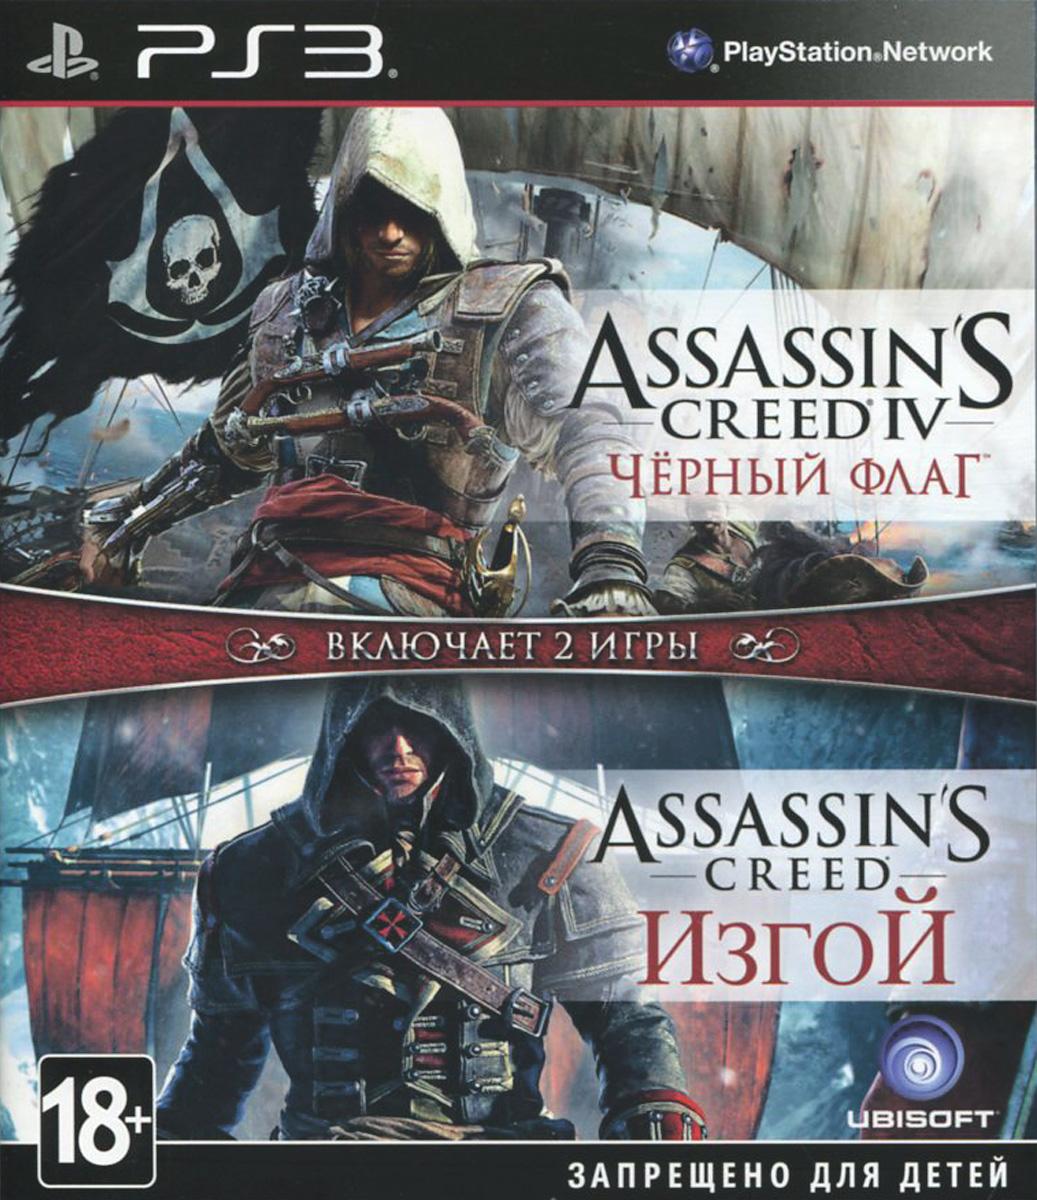 Ubisoft Entertainment Assassin's Creed IV: Черный Флаг + Assassin's Creed: Изгой (PS3)